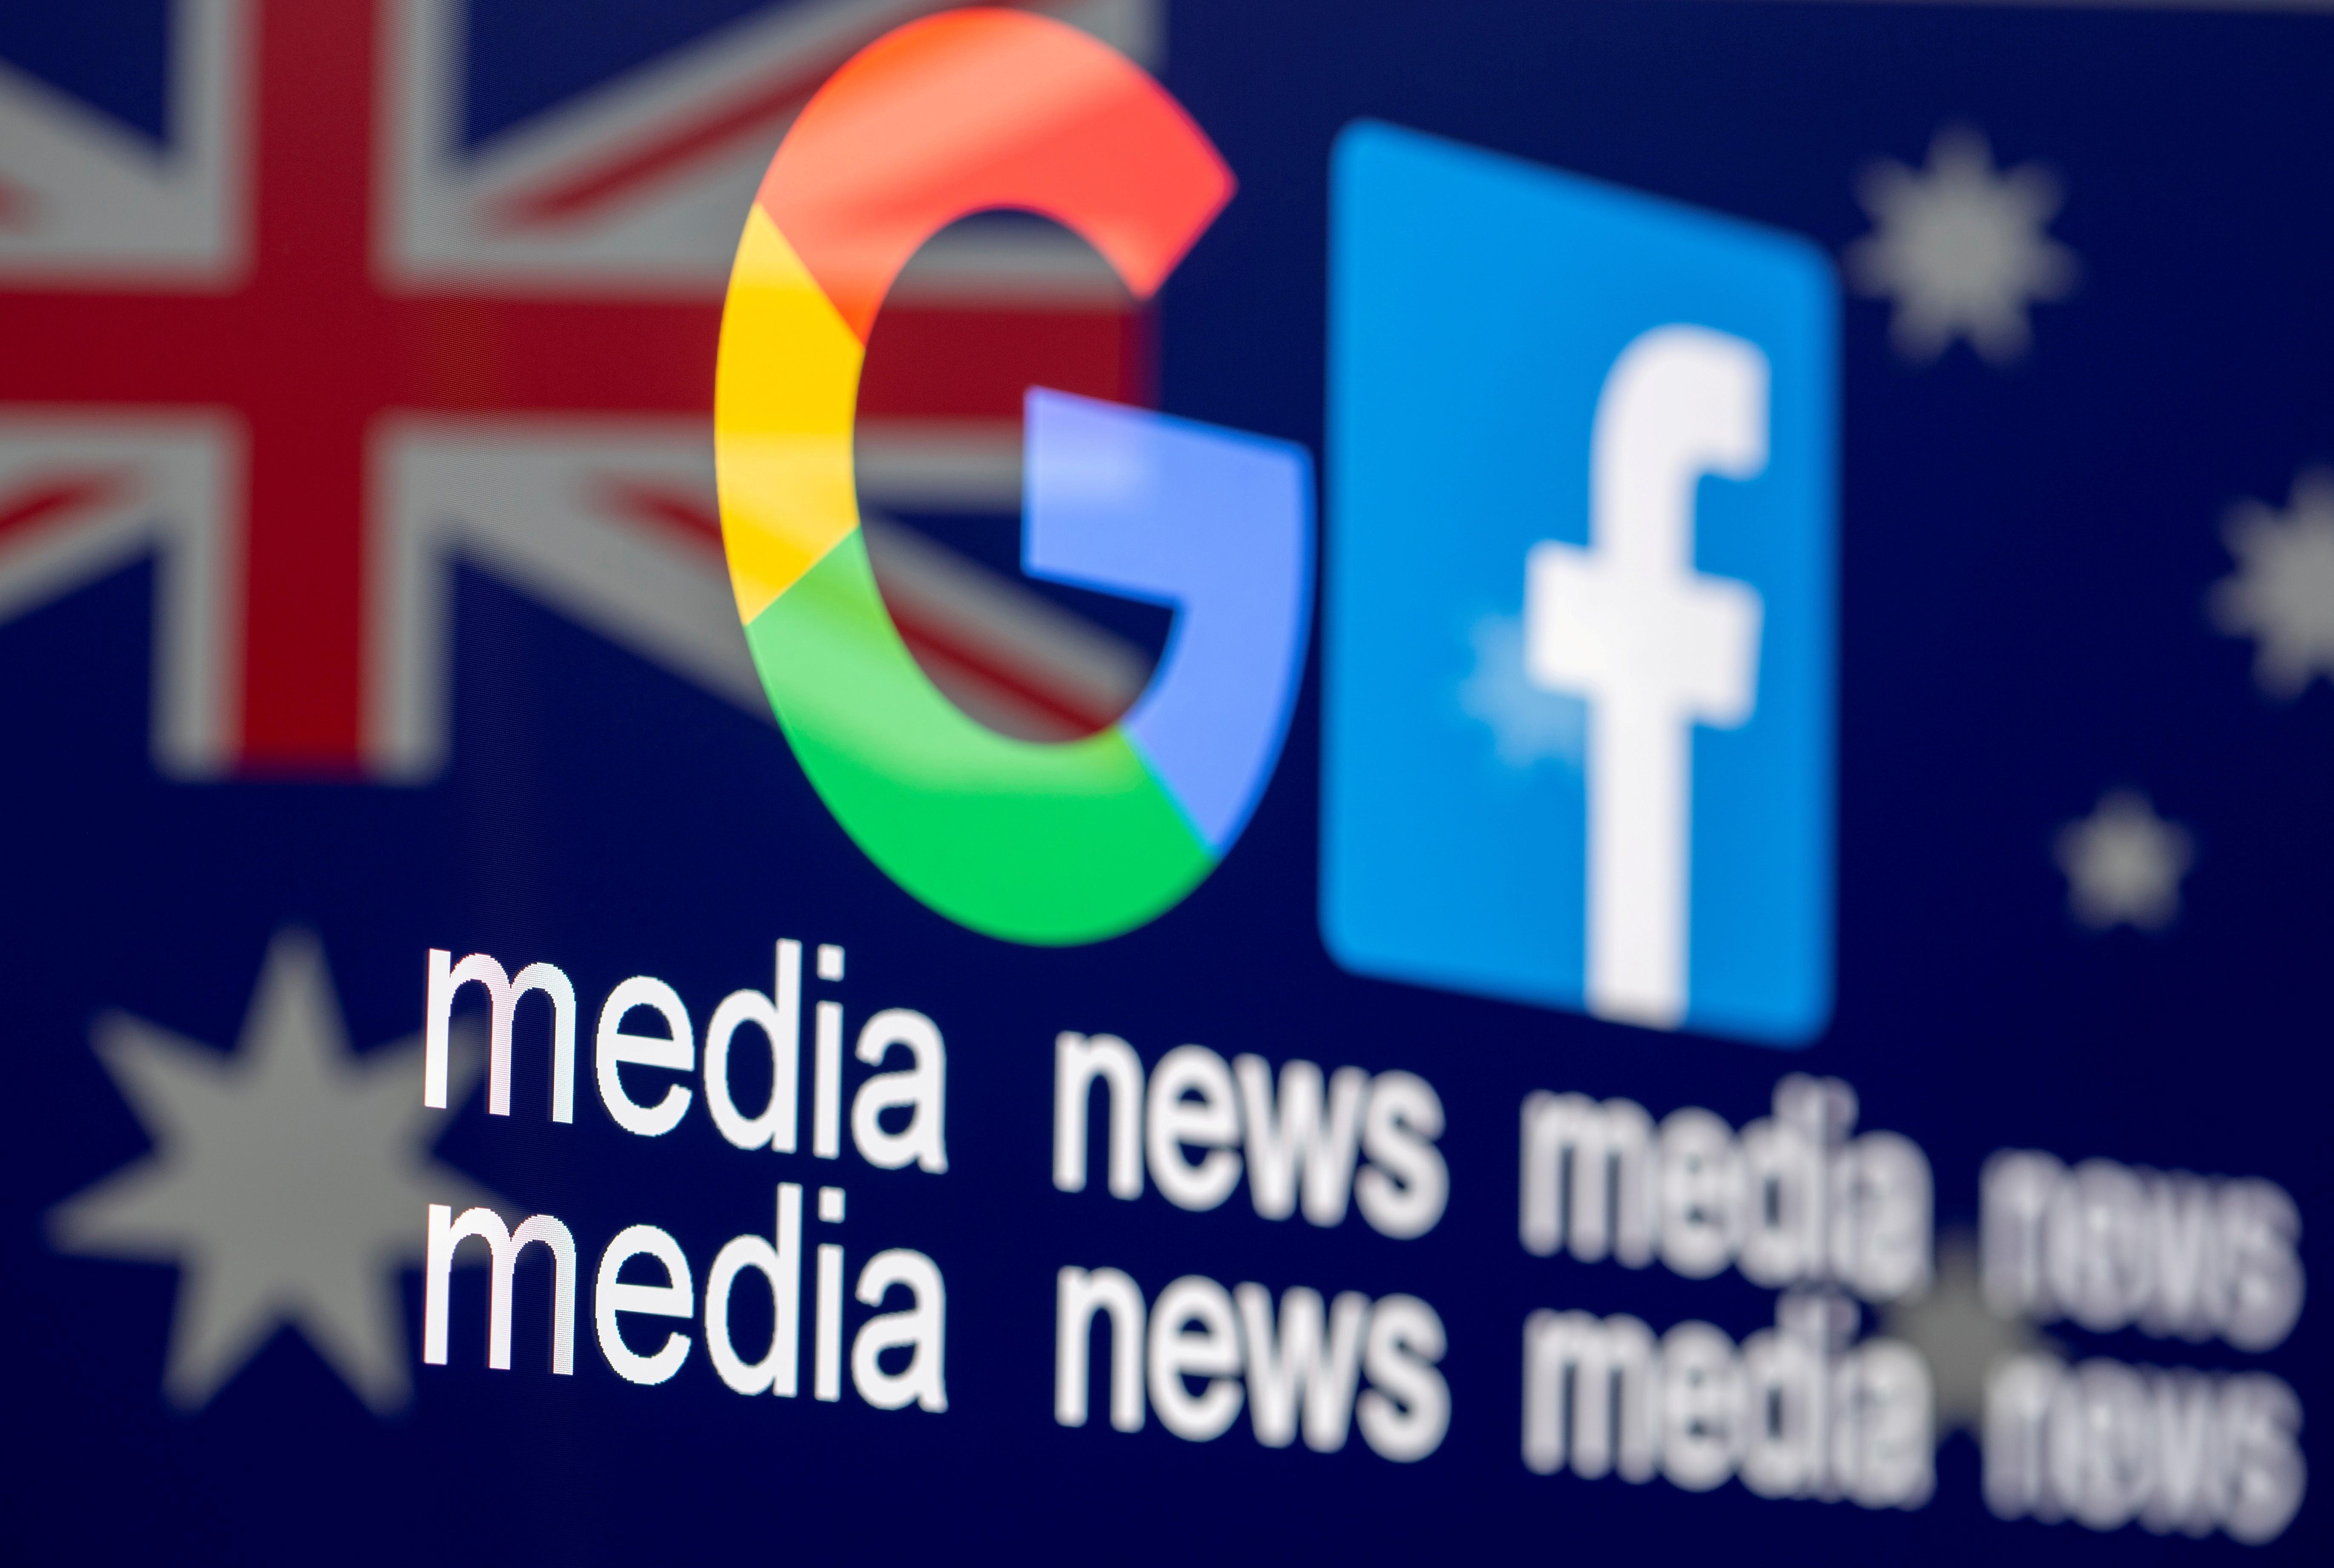 Google,法國,Facebook,媒體,新聞,出版,網路,歐盟,澳洲